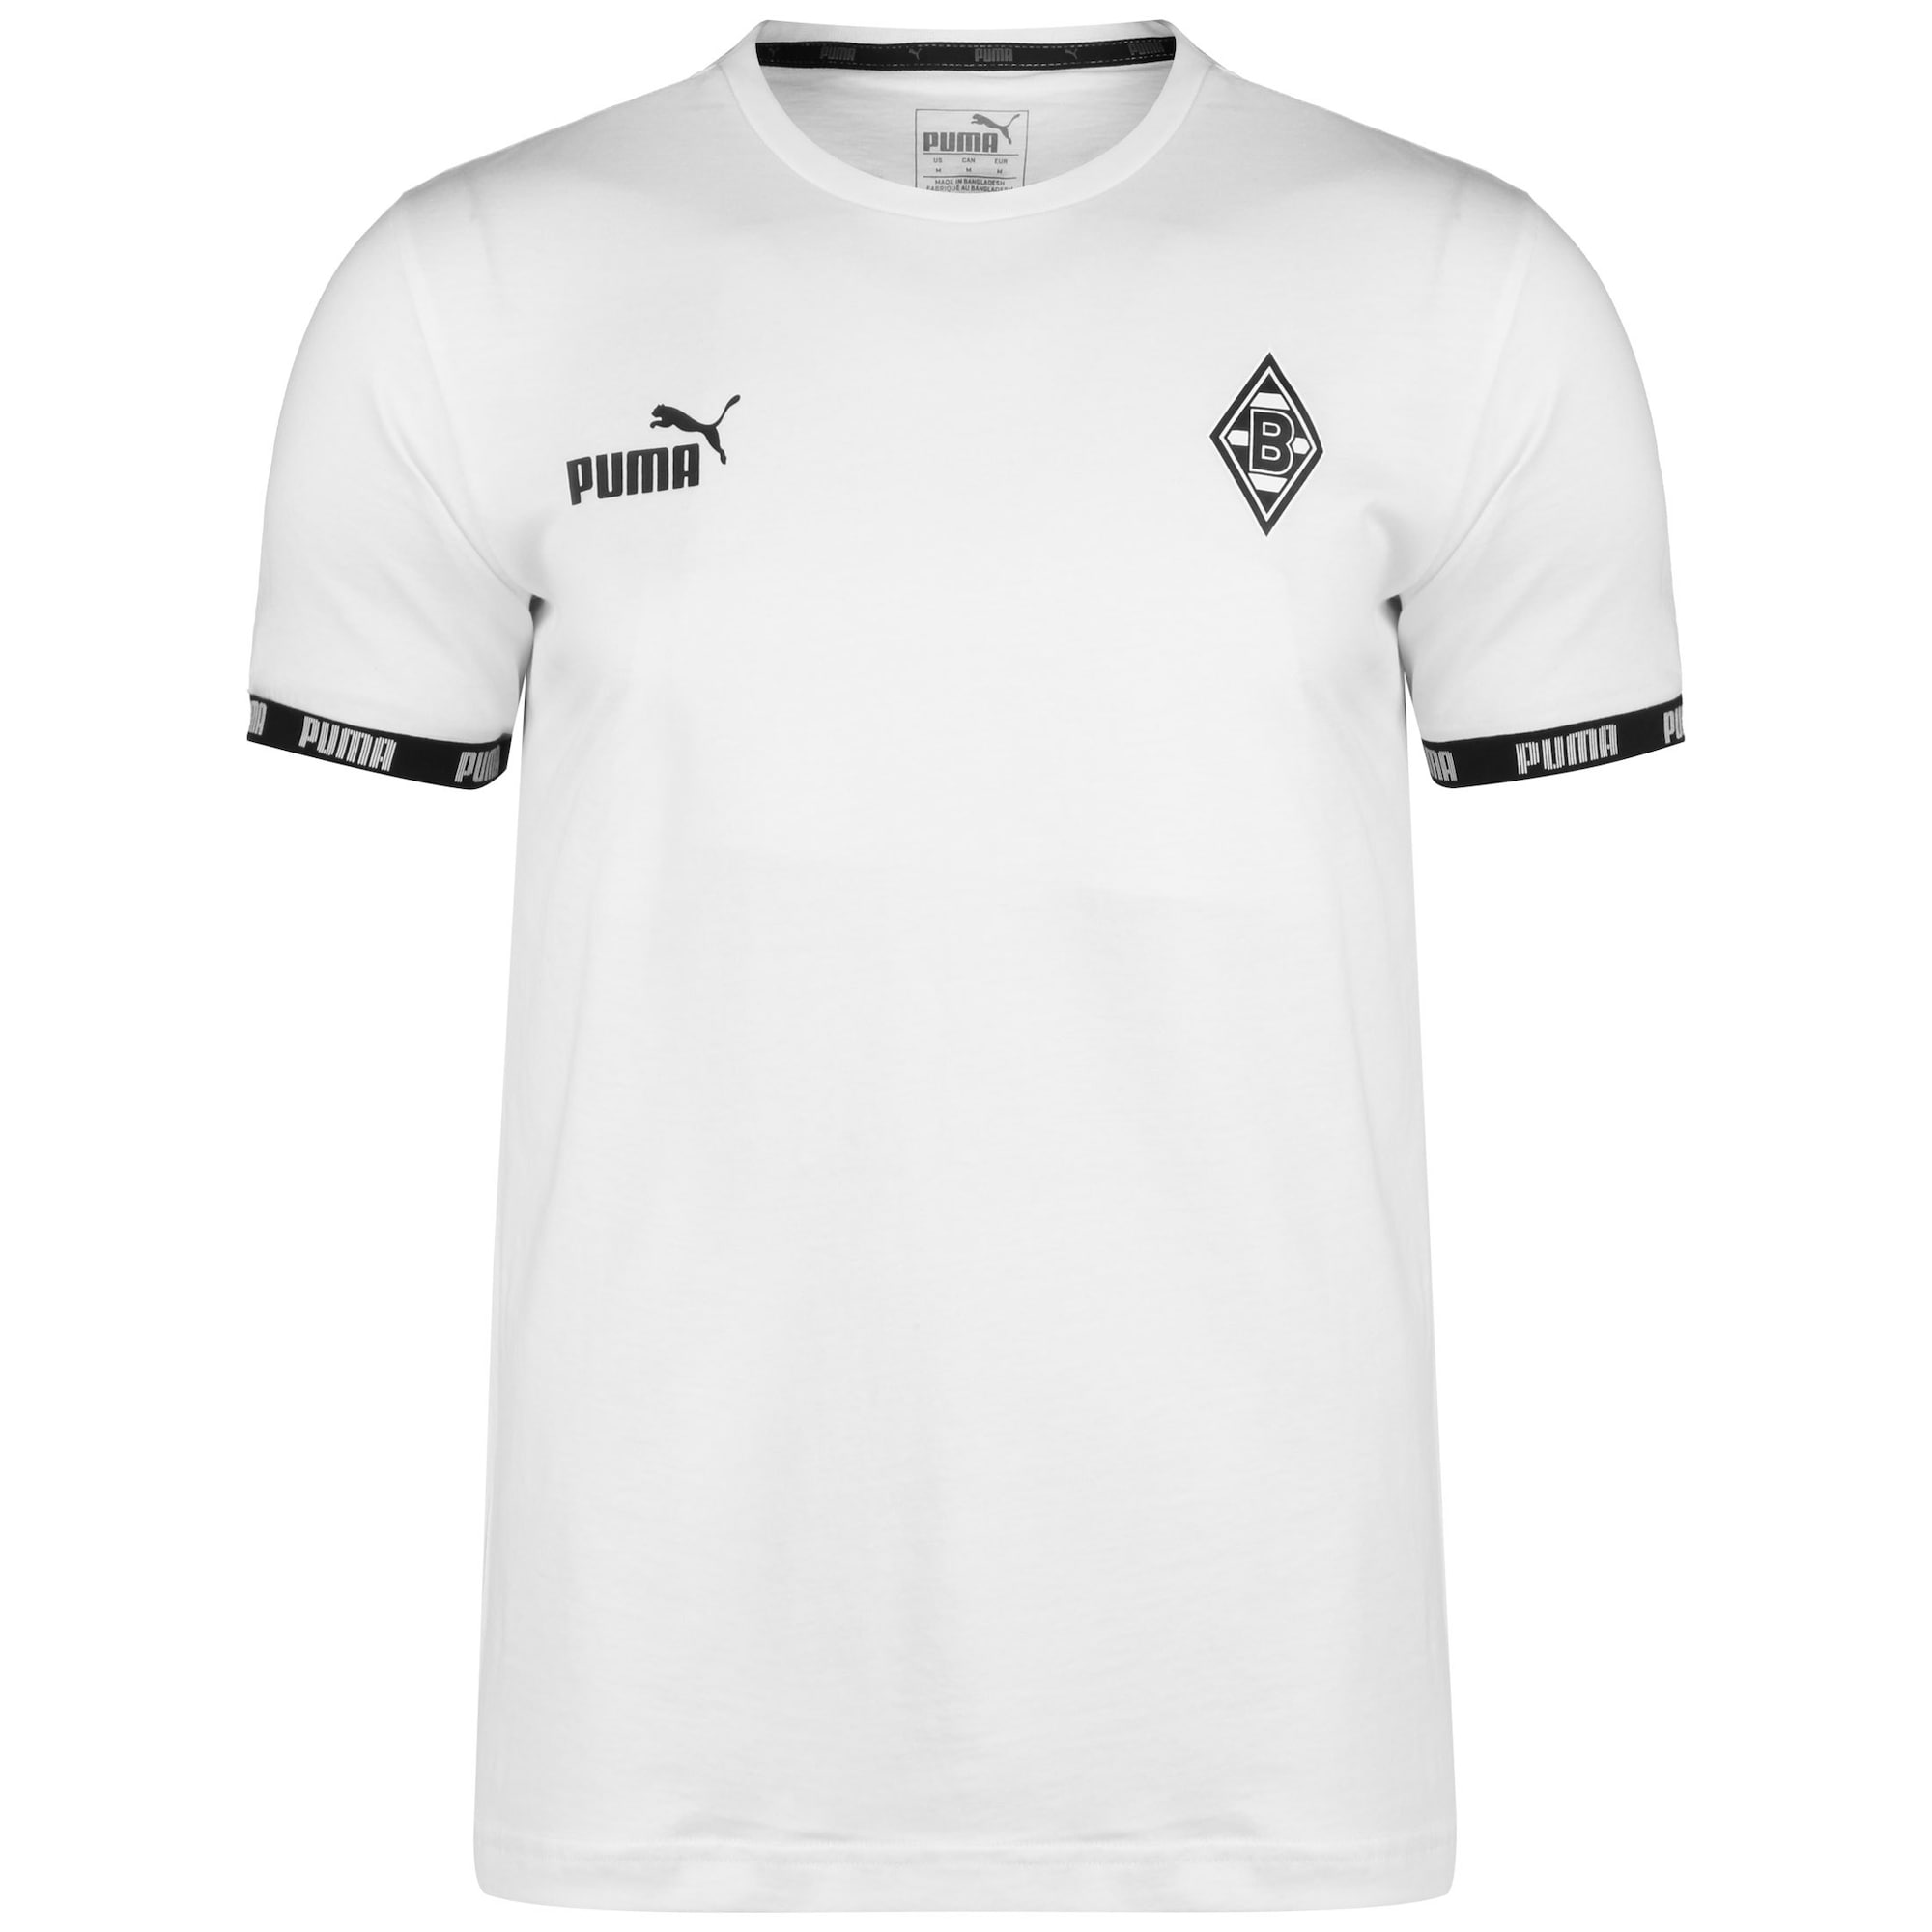 Borussia Mönchengladbach Football Culture T-Shirt Herren